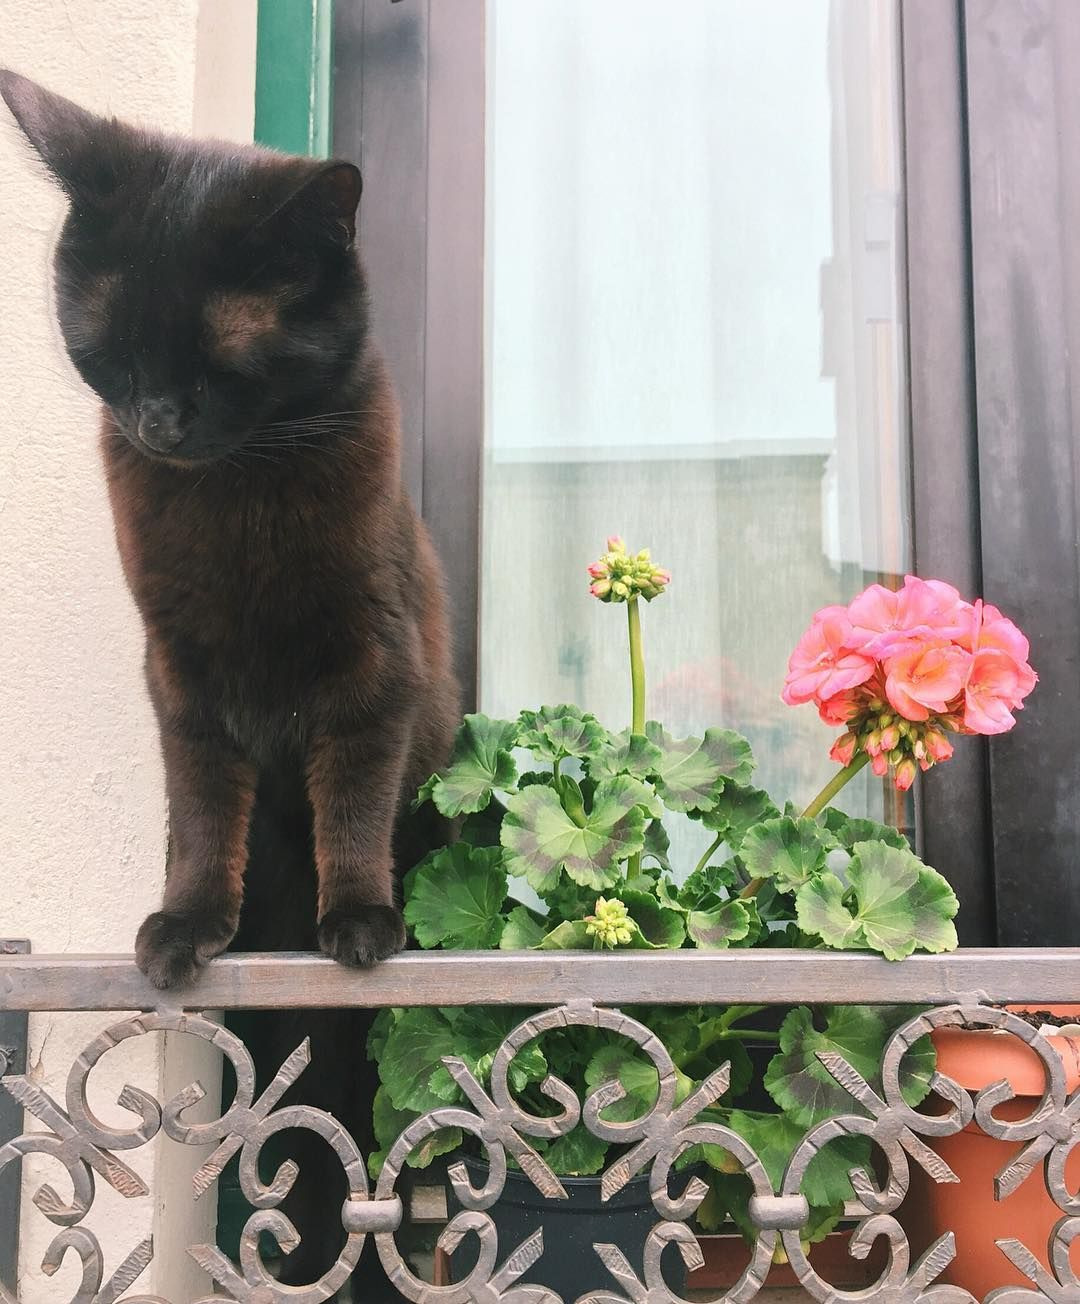 Pretty kitty on a windowsill